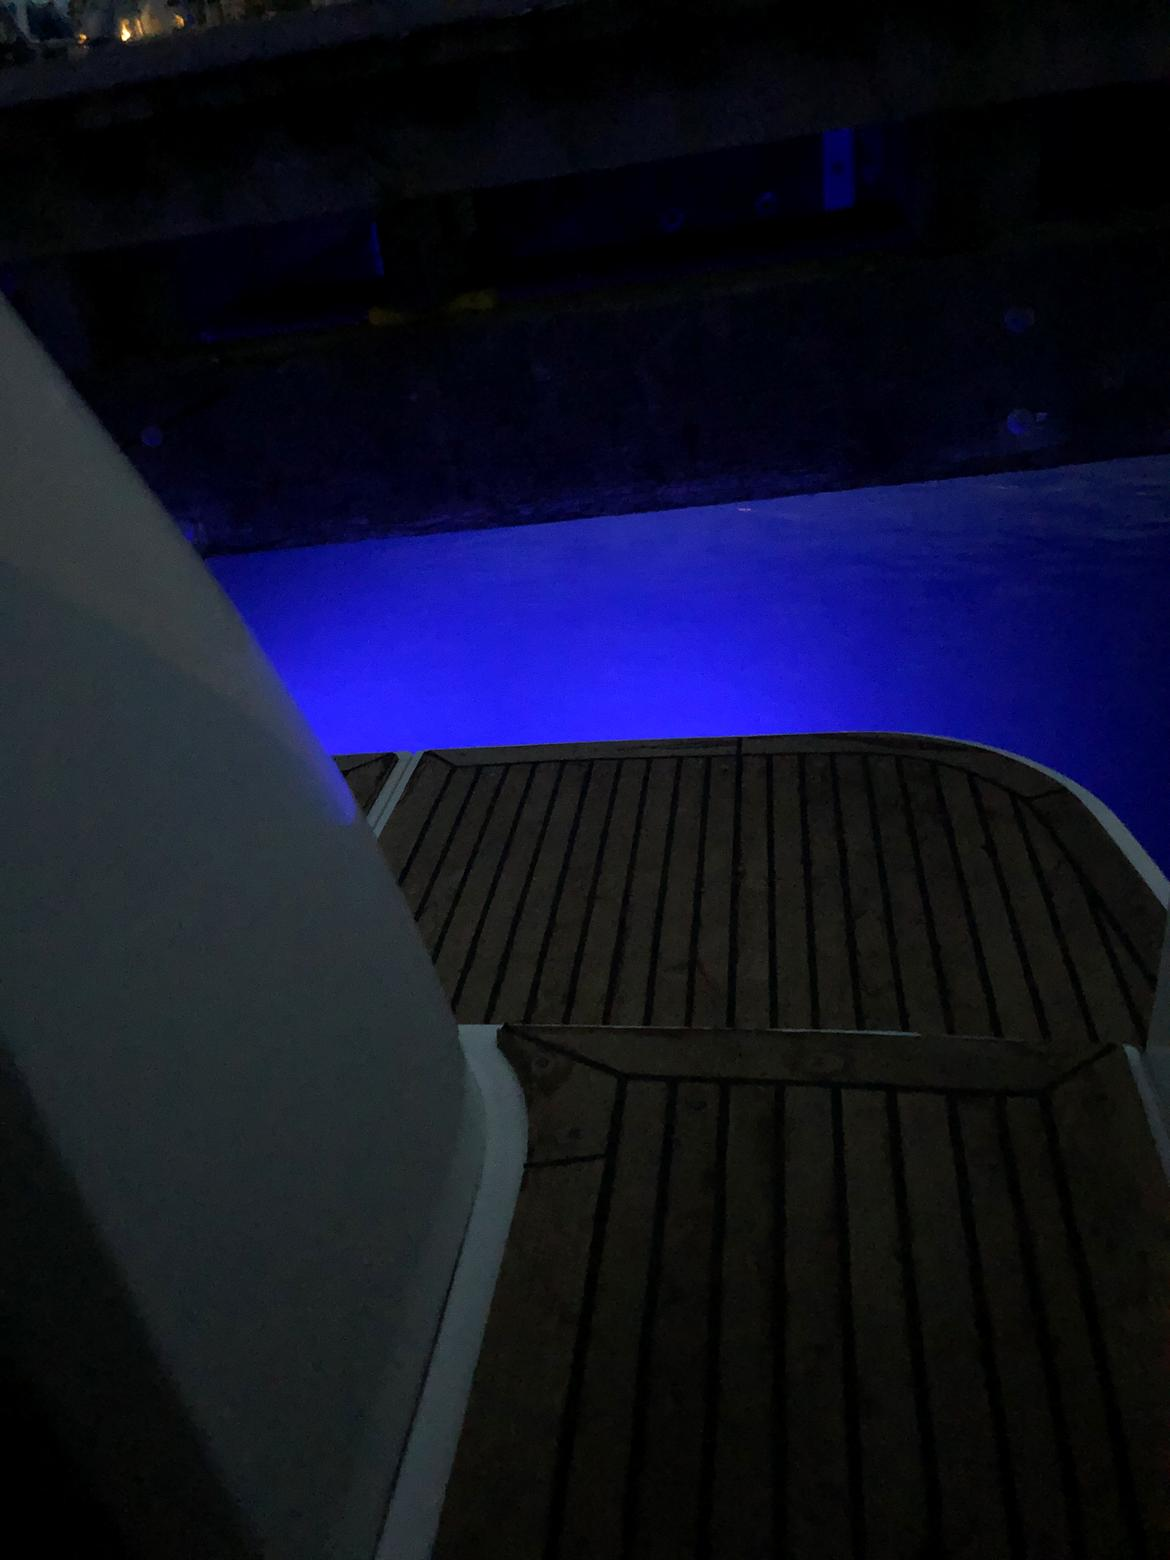 Sea Ray Sundance 270 billede 22